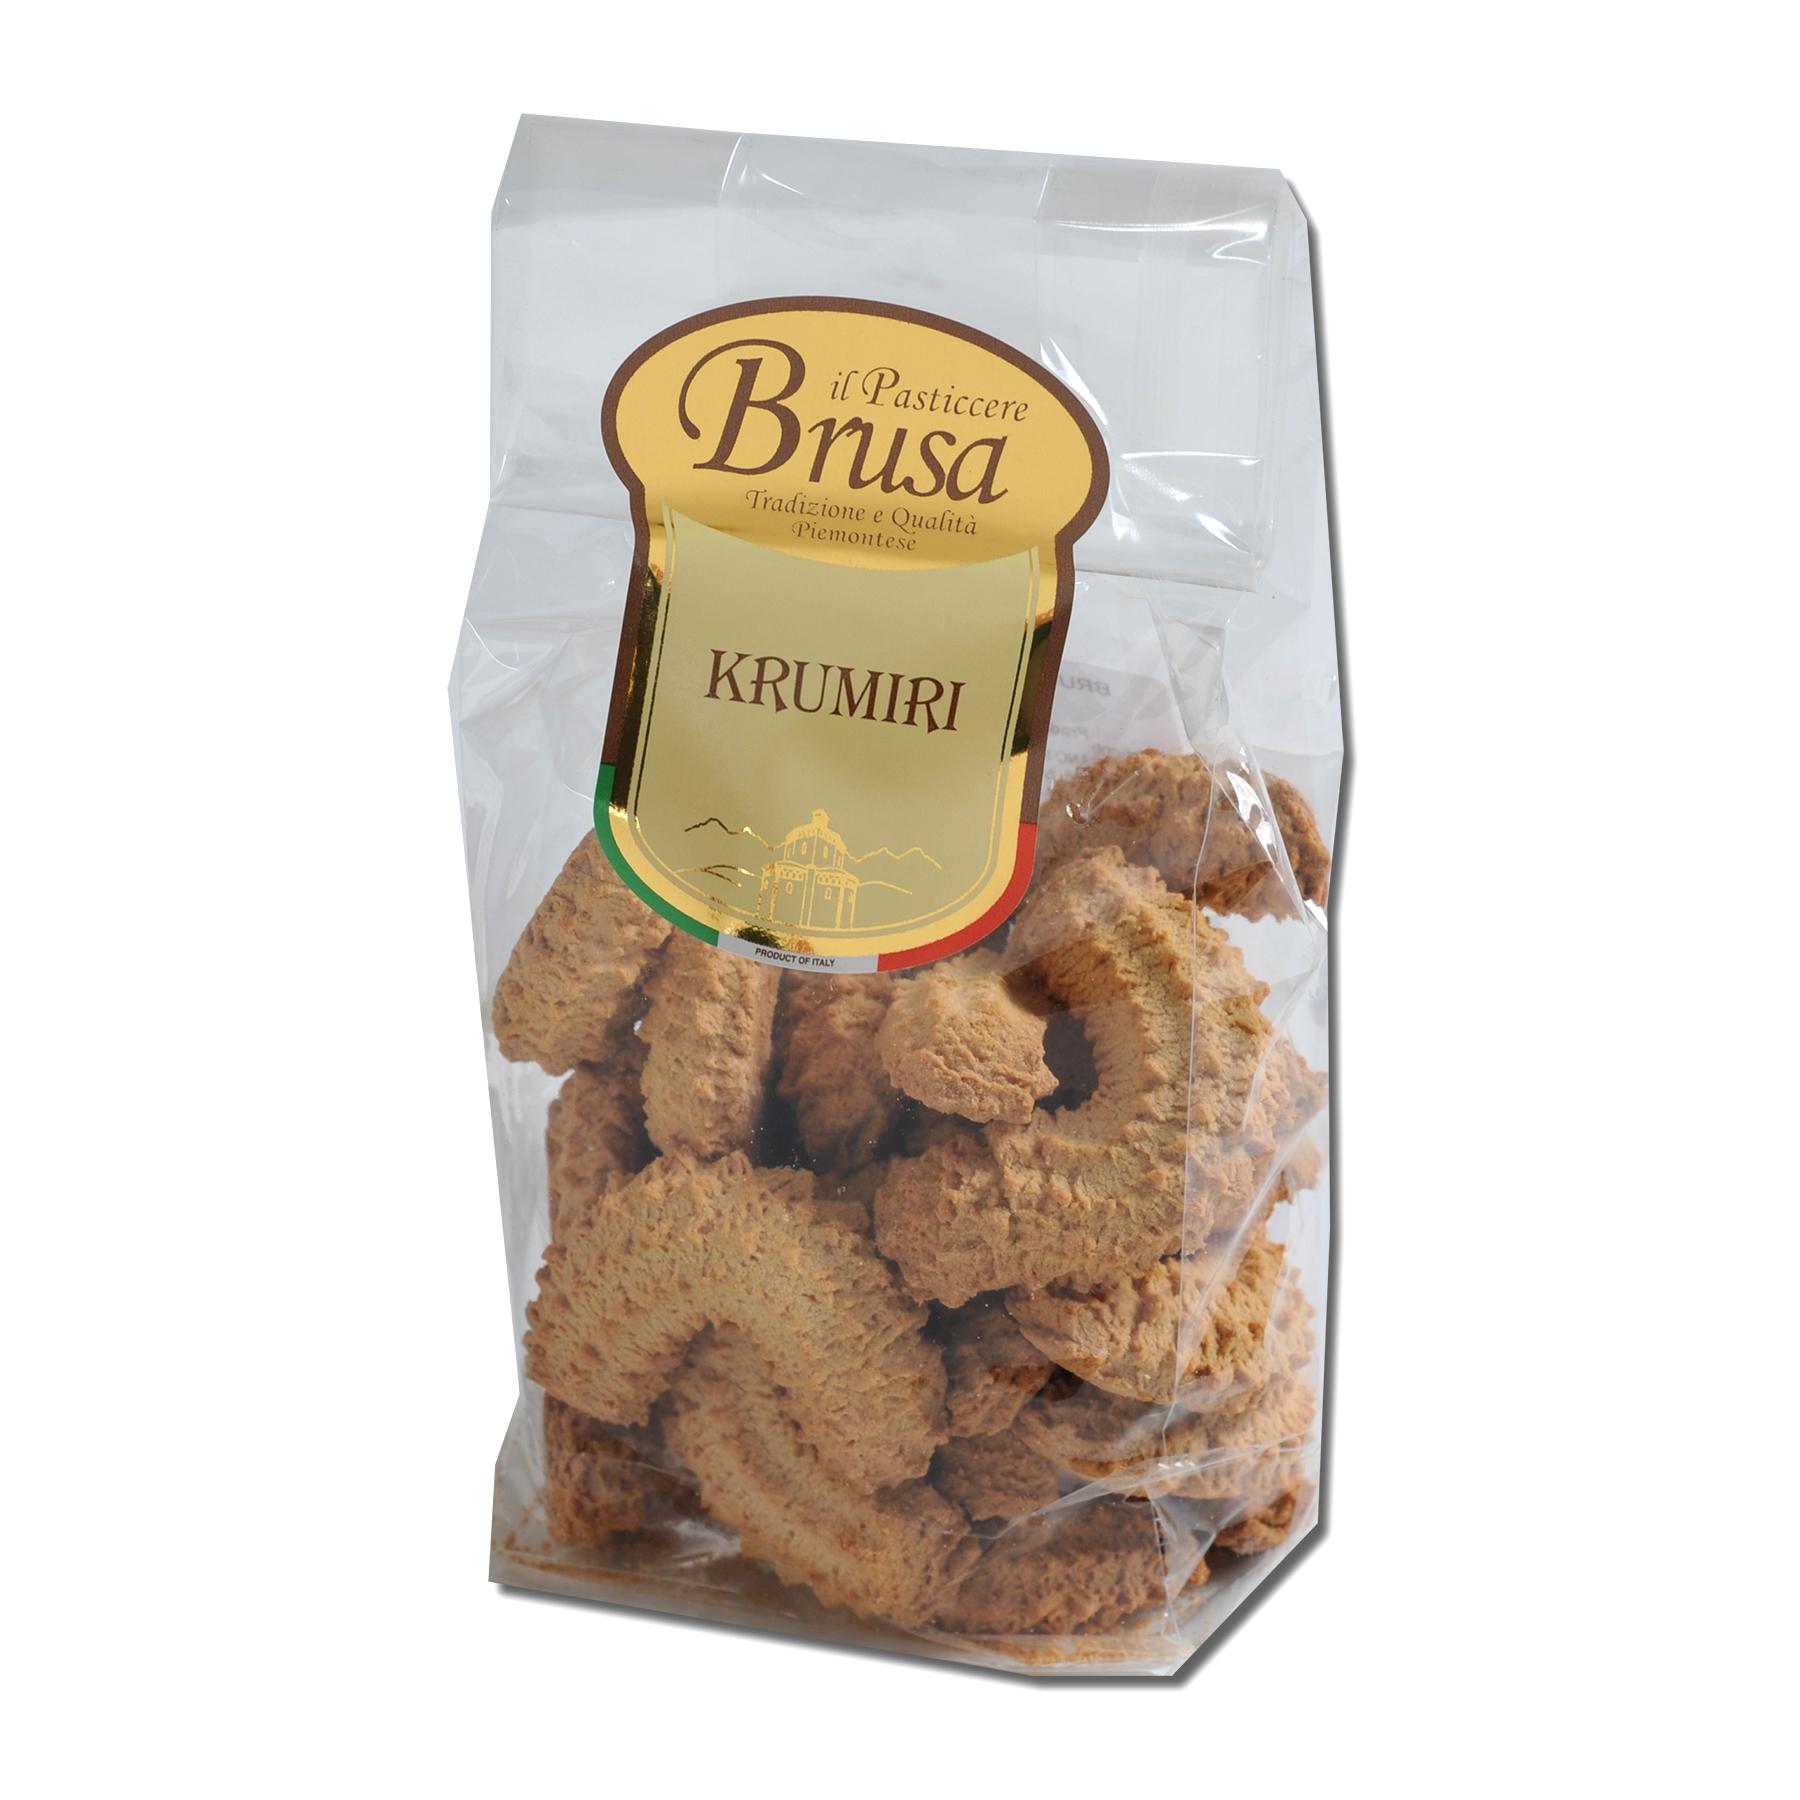 krumiri-biscuits-250g